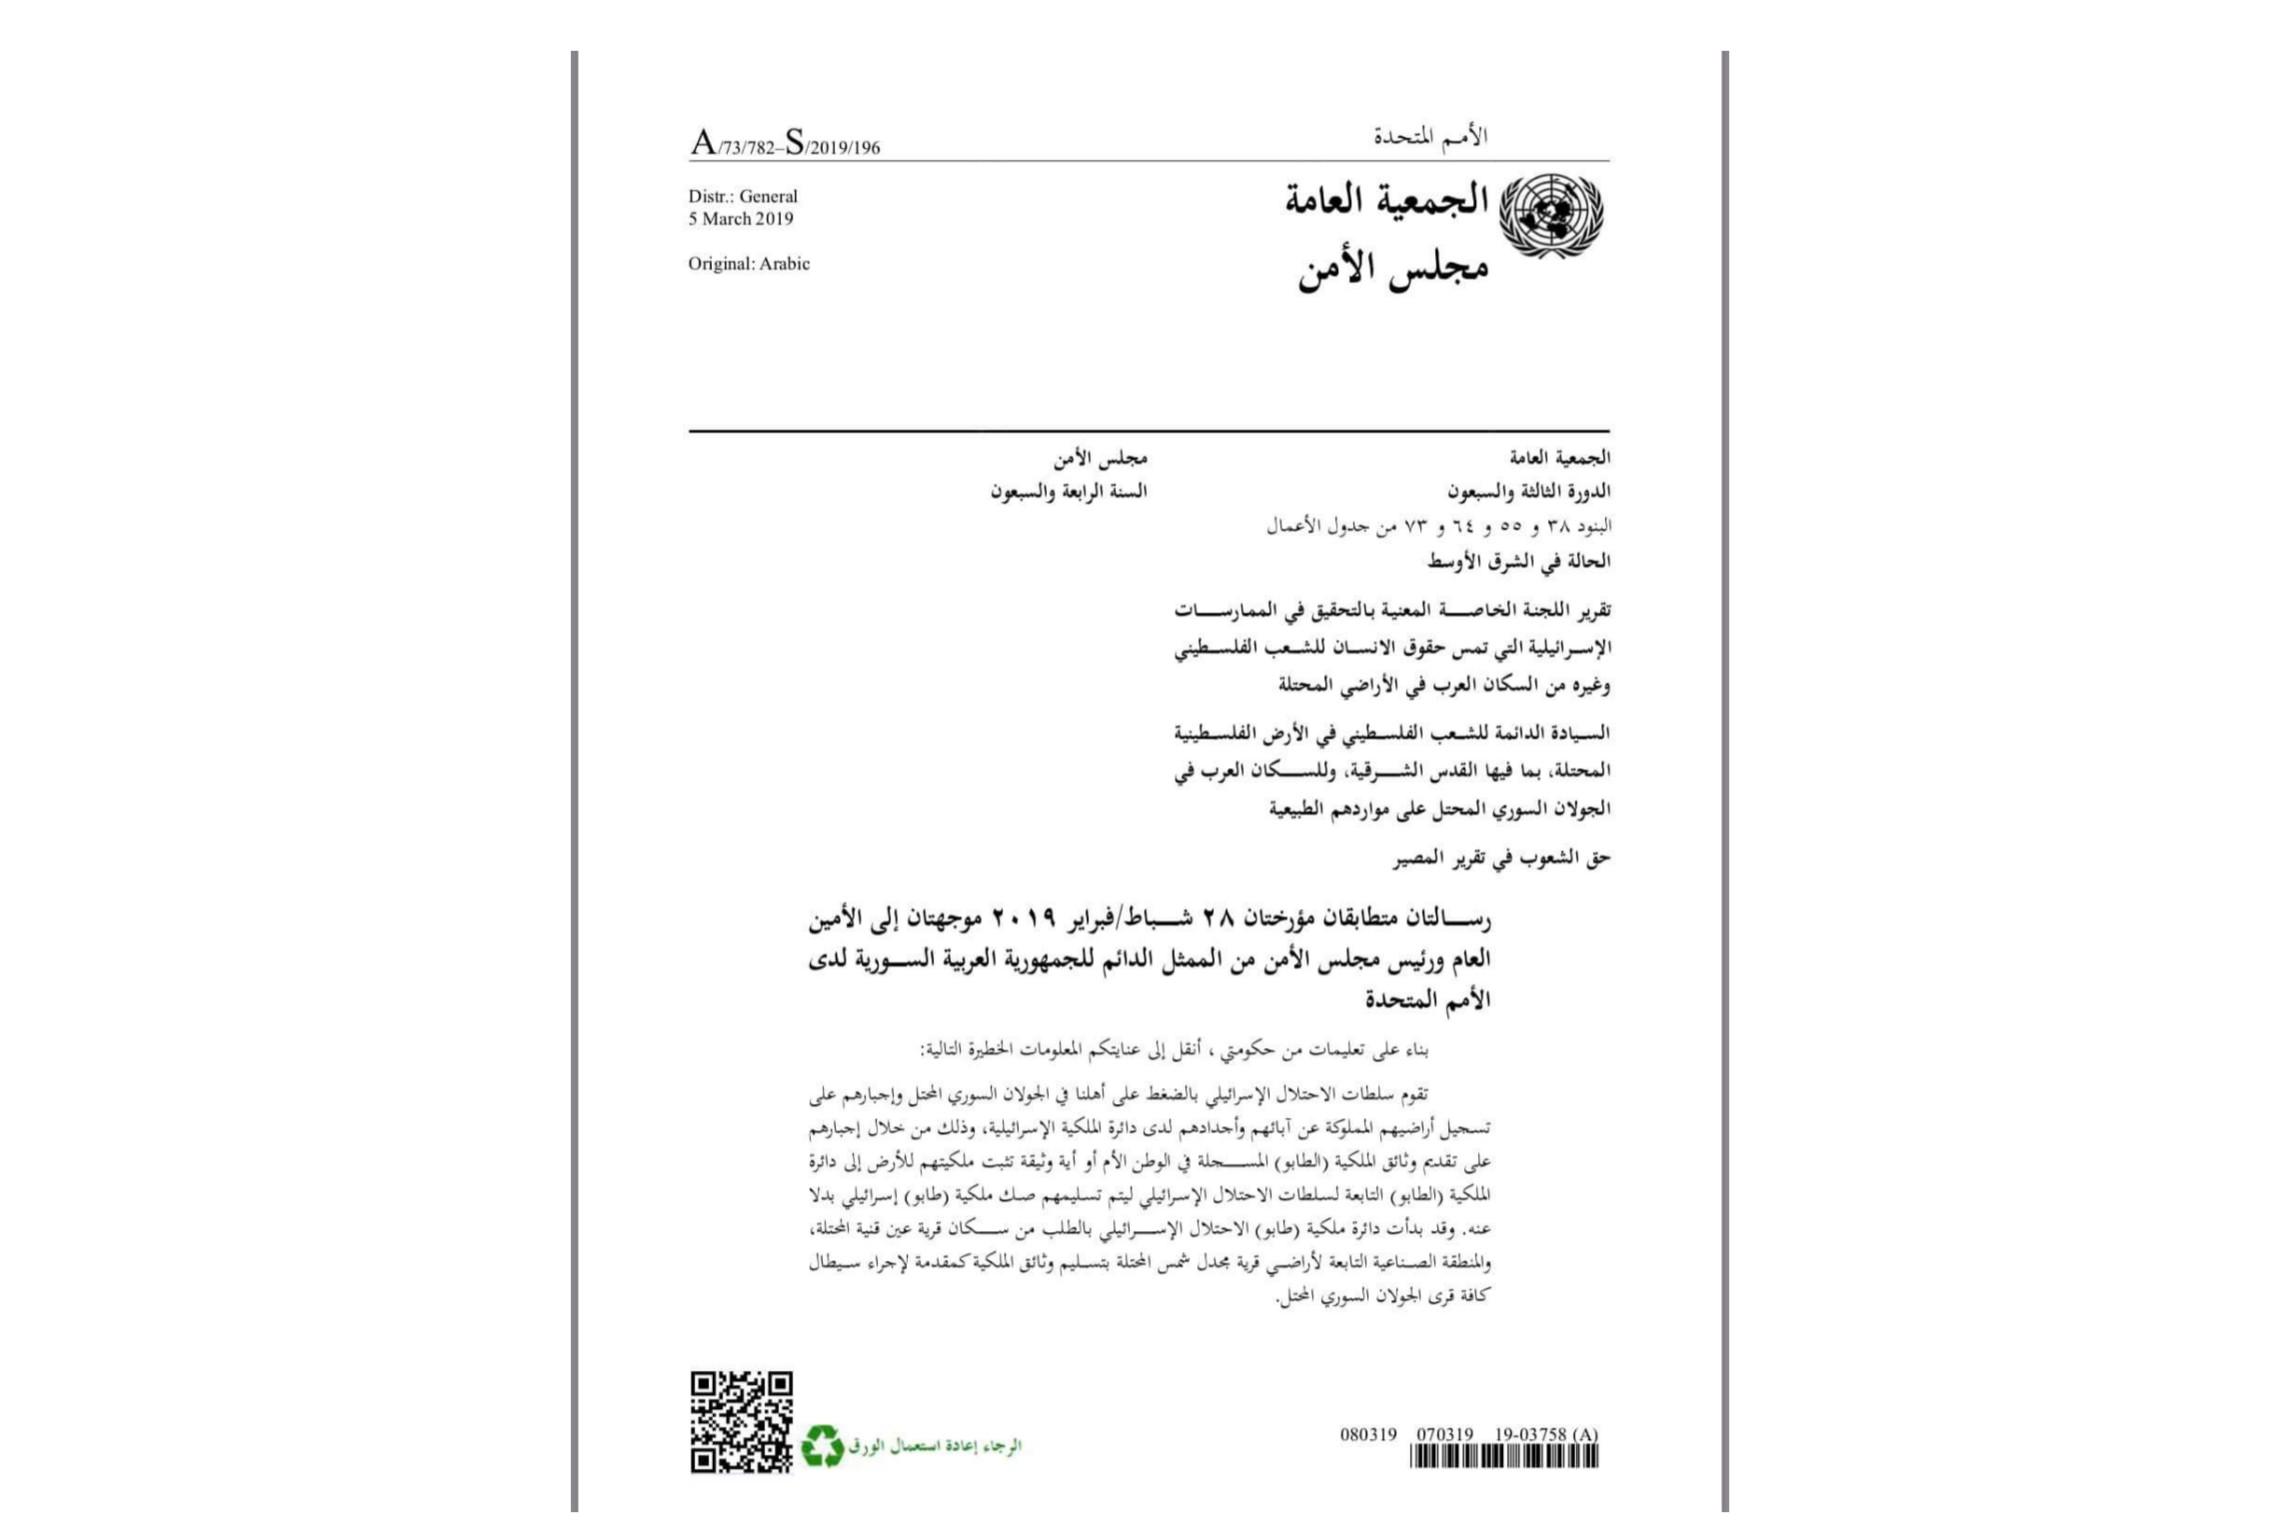 Photo of بالصور- رسالة سفير سوريا لمجلس الأمن بخصوص انتهاكات الاحتلال الاسرائيلي ضد أراضي أهلنا بالجولان المحتل